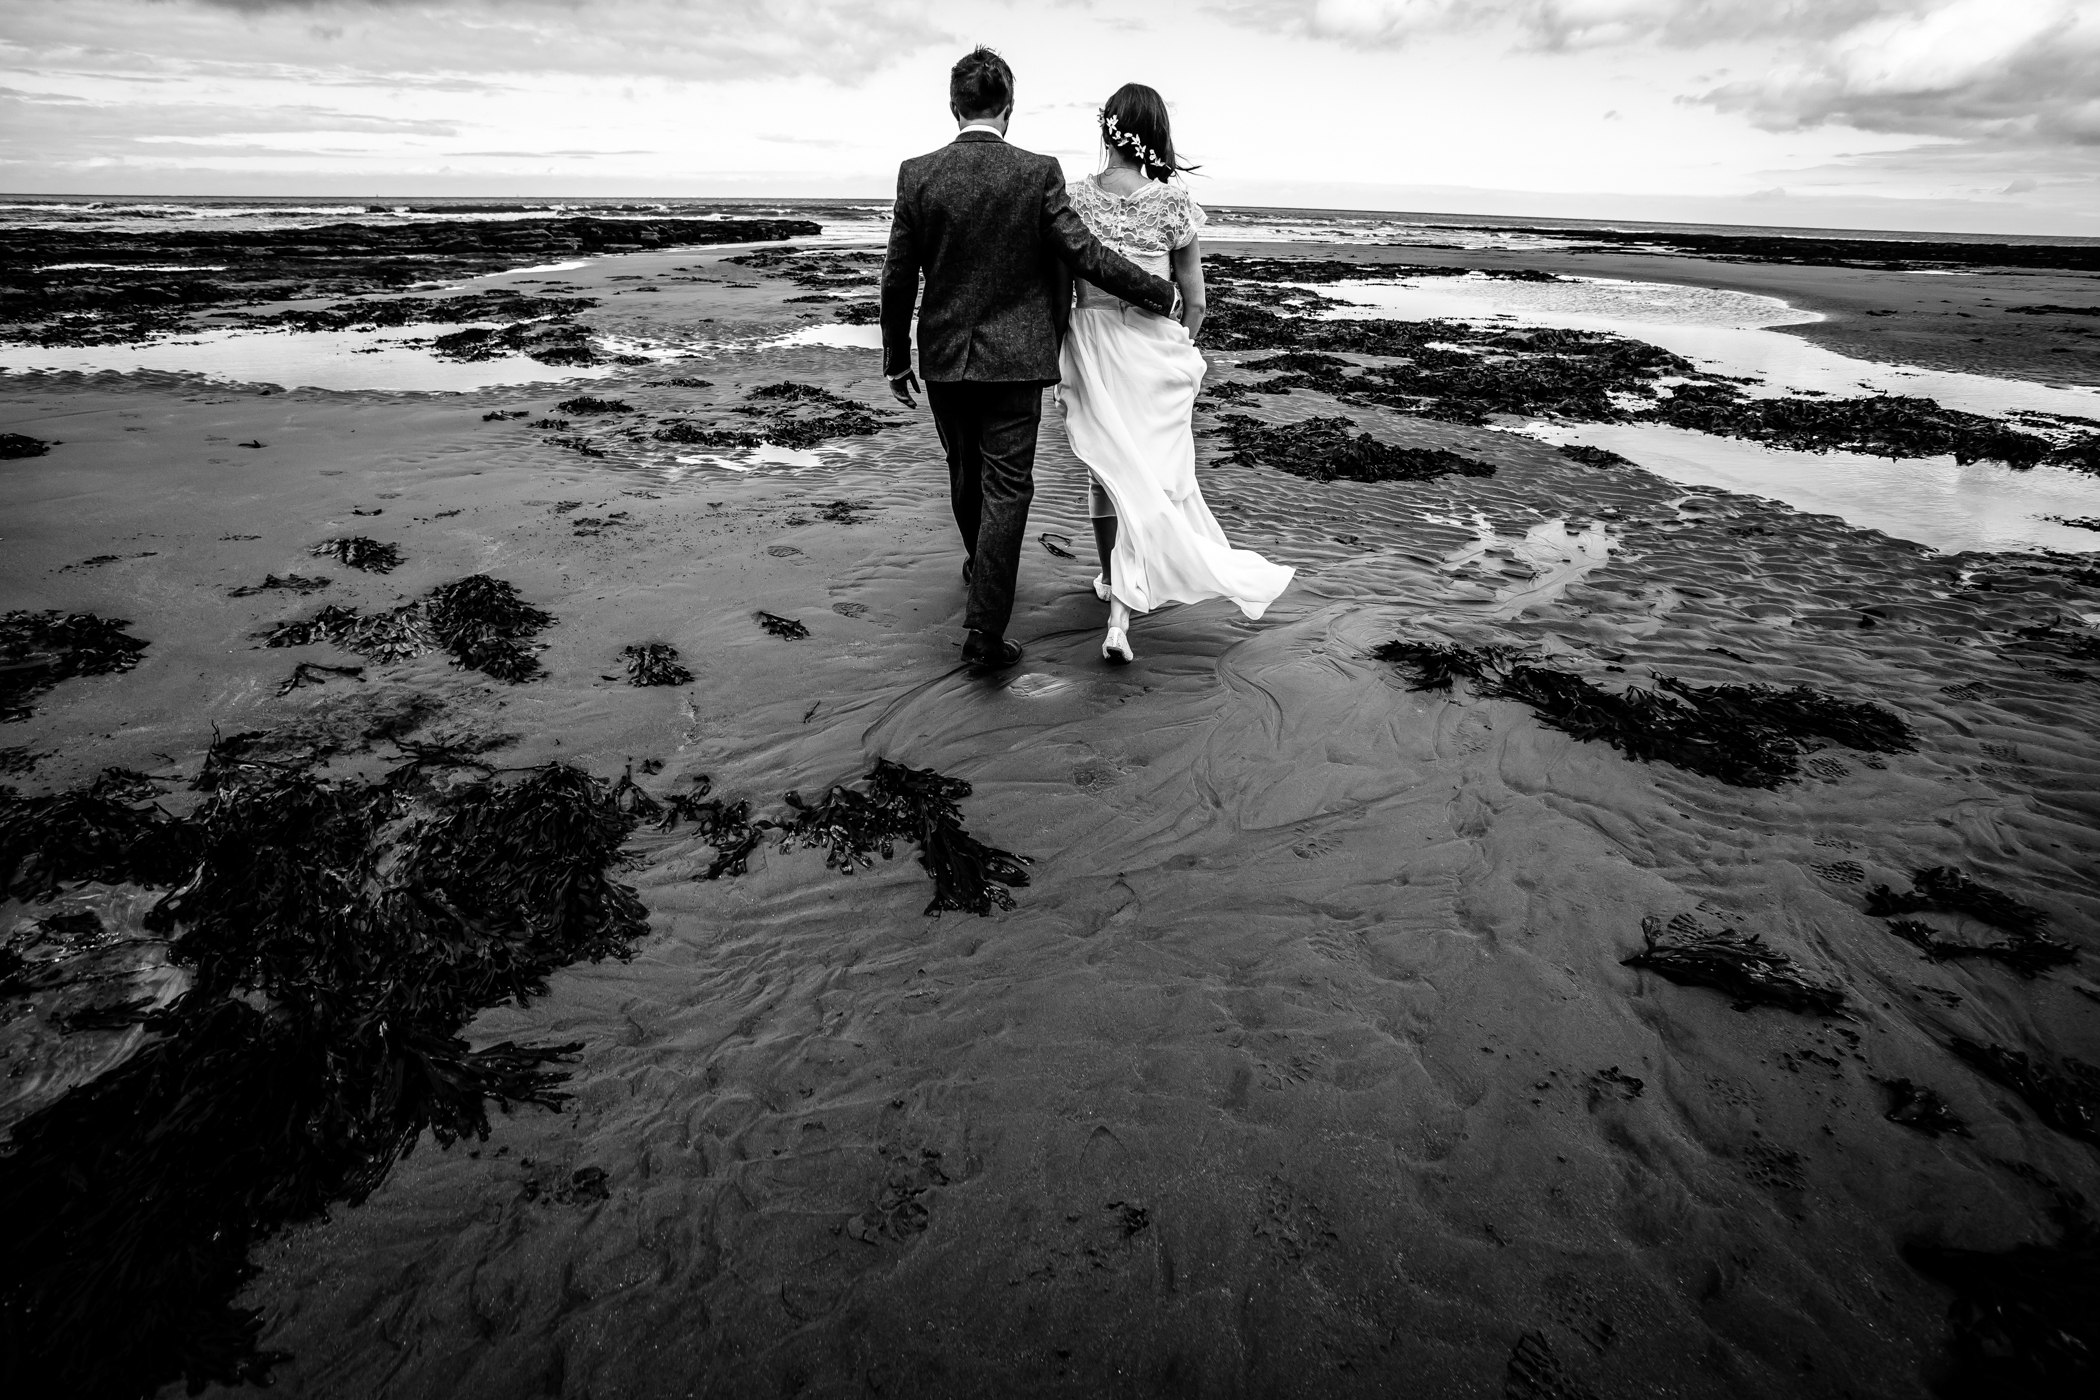 sansom photography beach wedding photography charlotte & mike-58